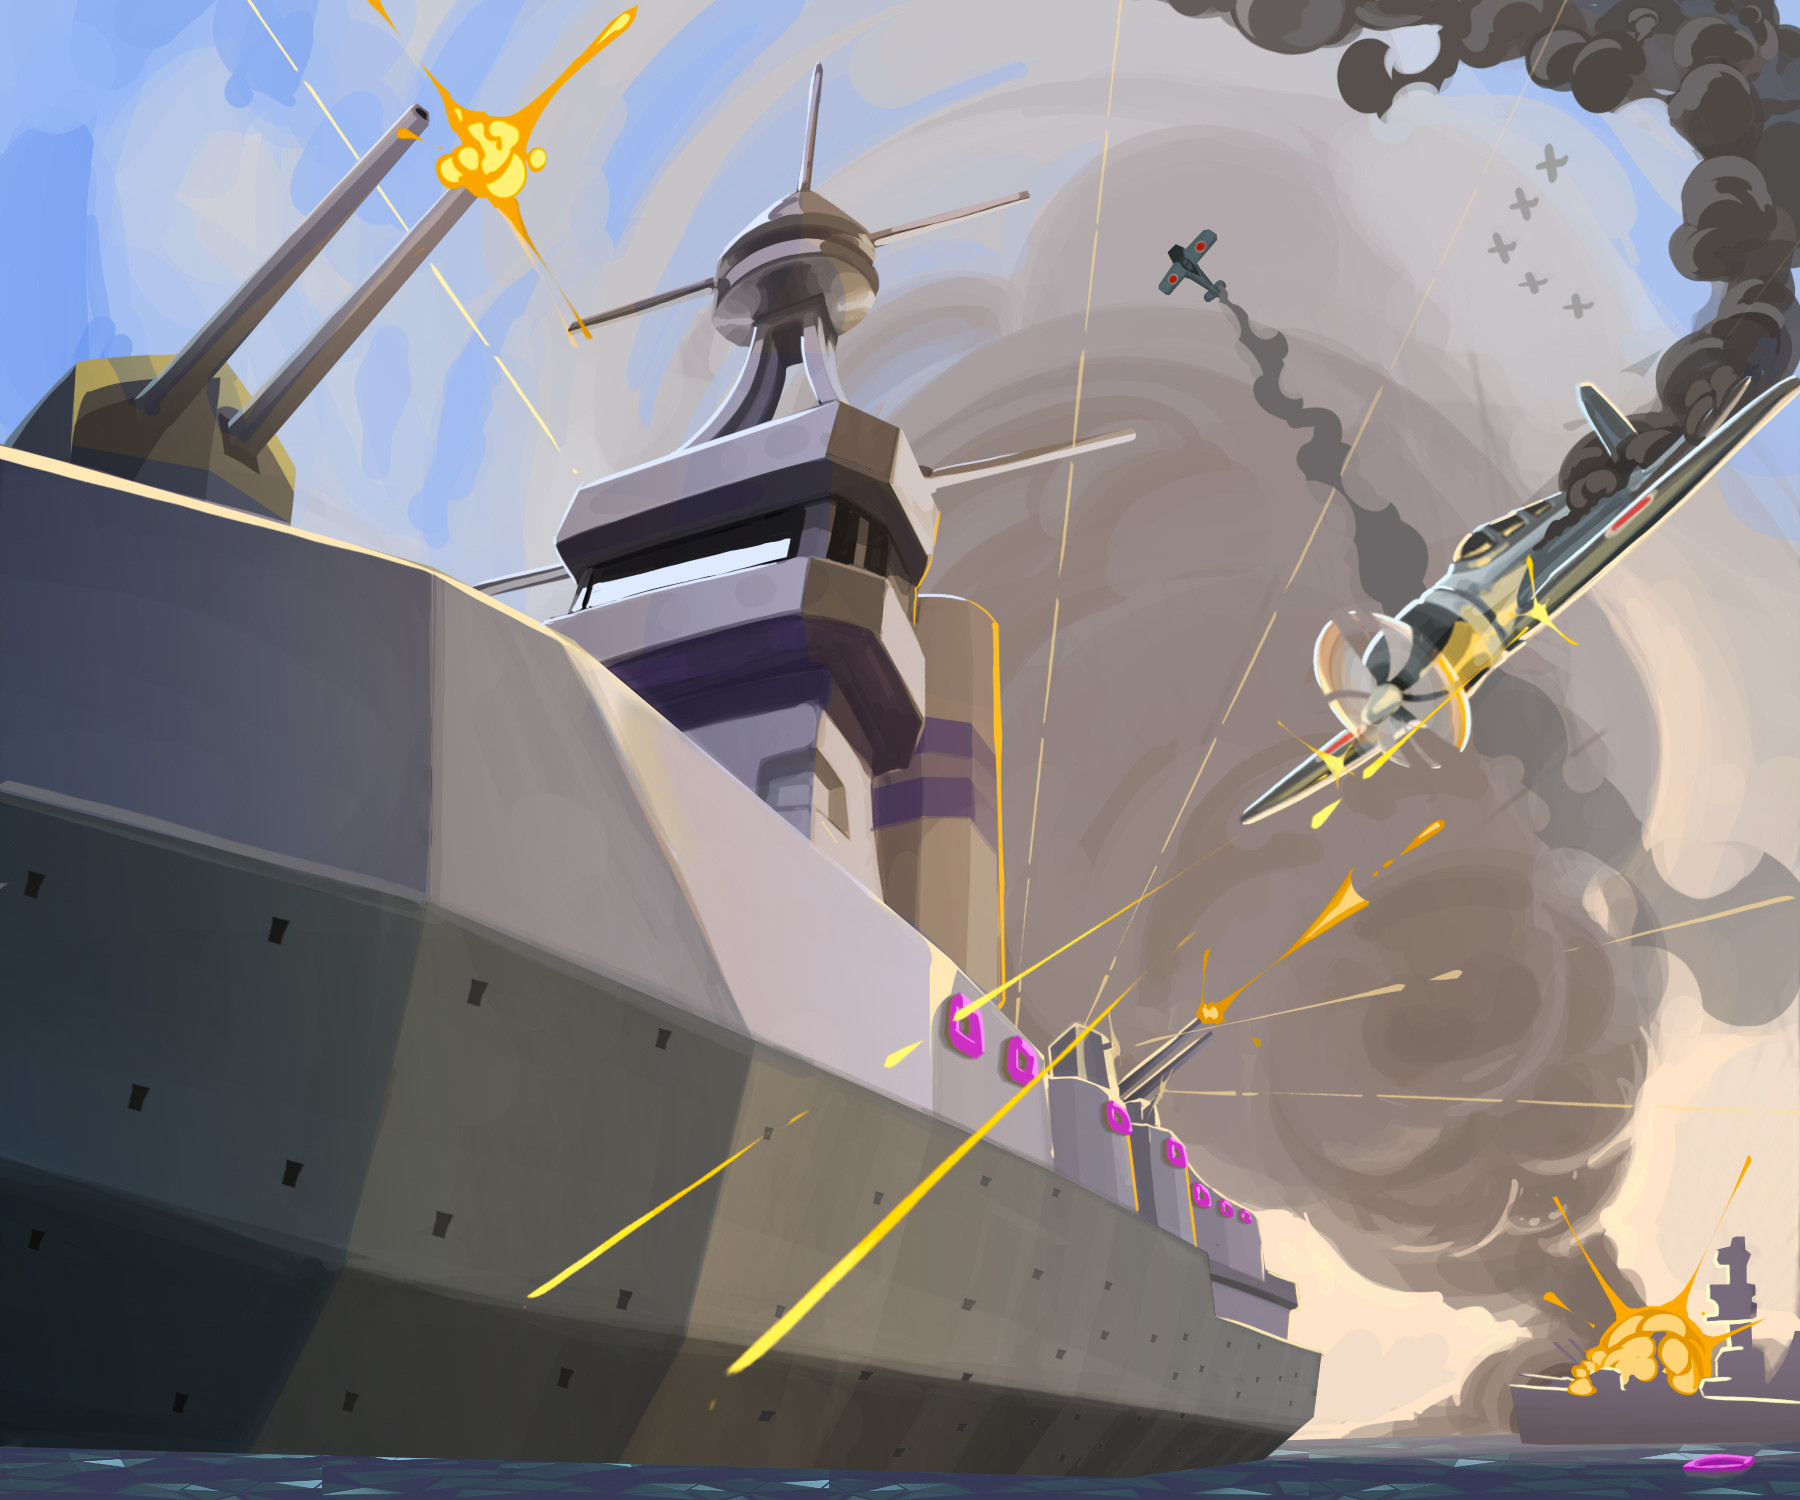 Nicolas morales world war ii battleships illustration doughnut